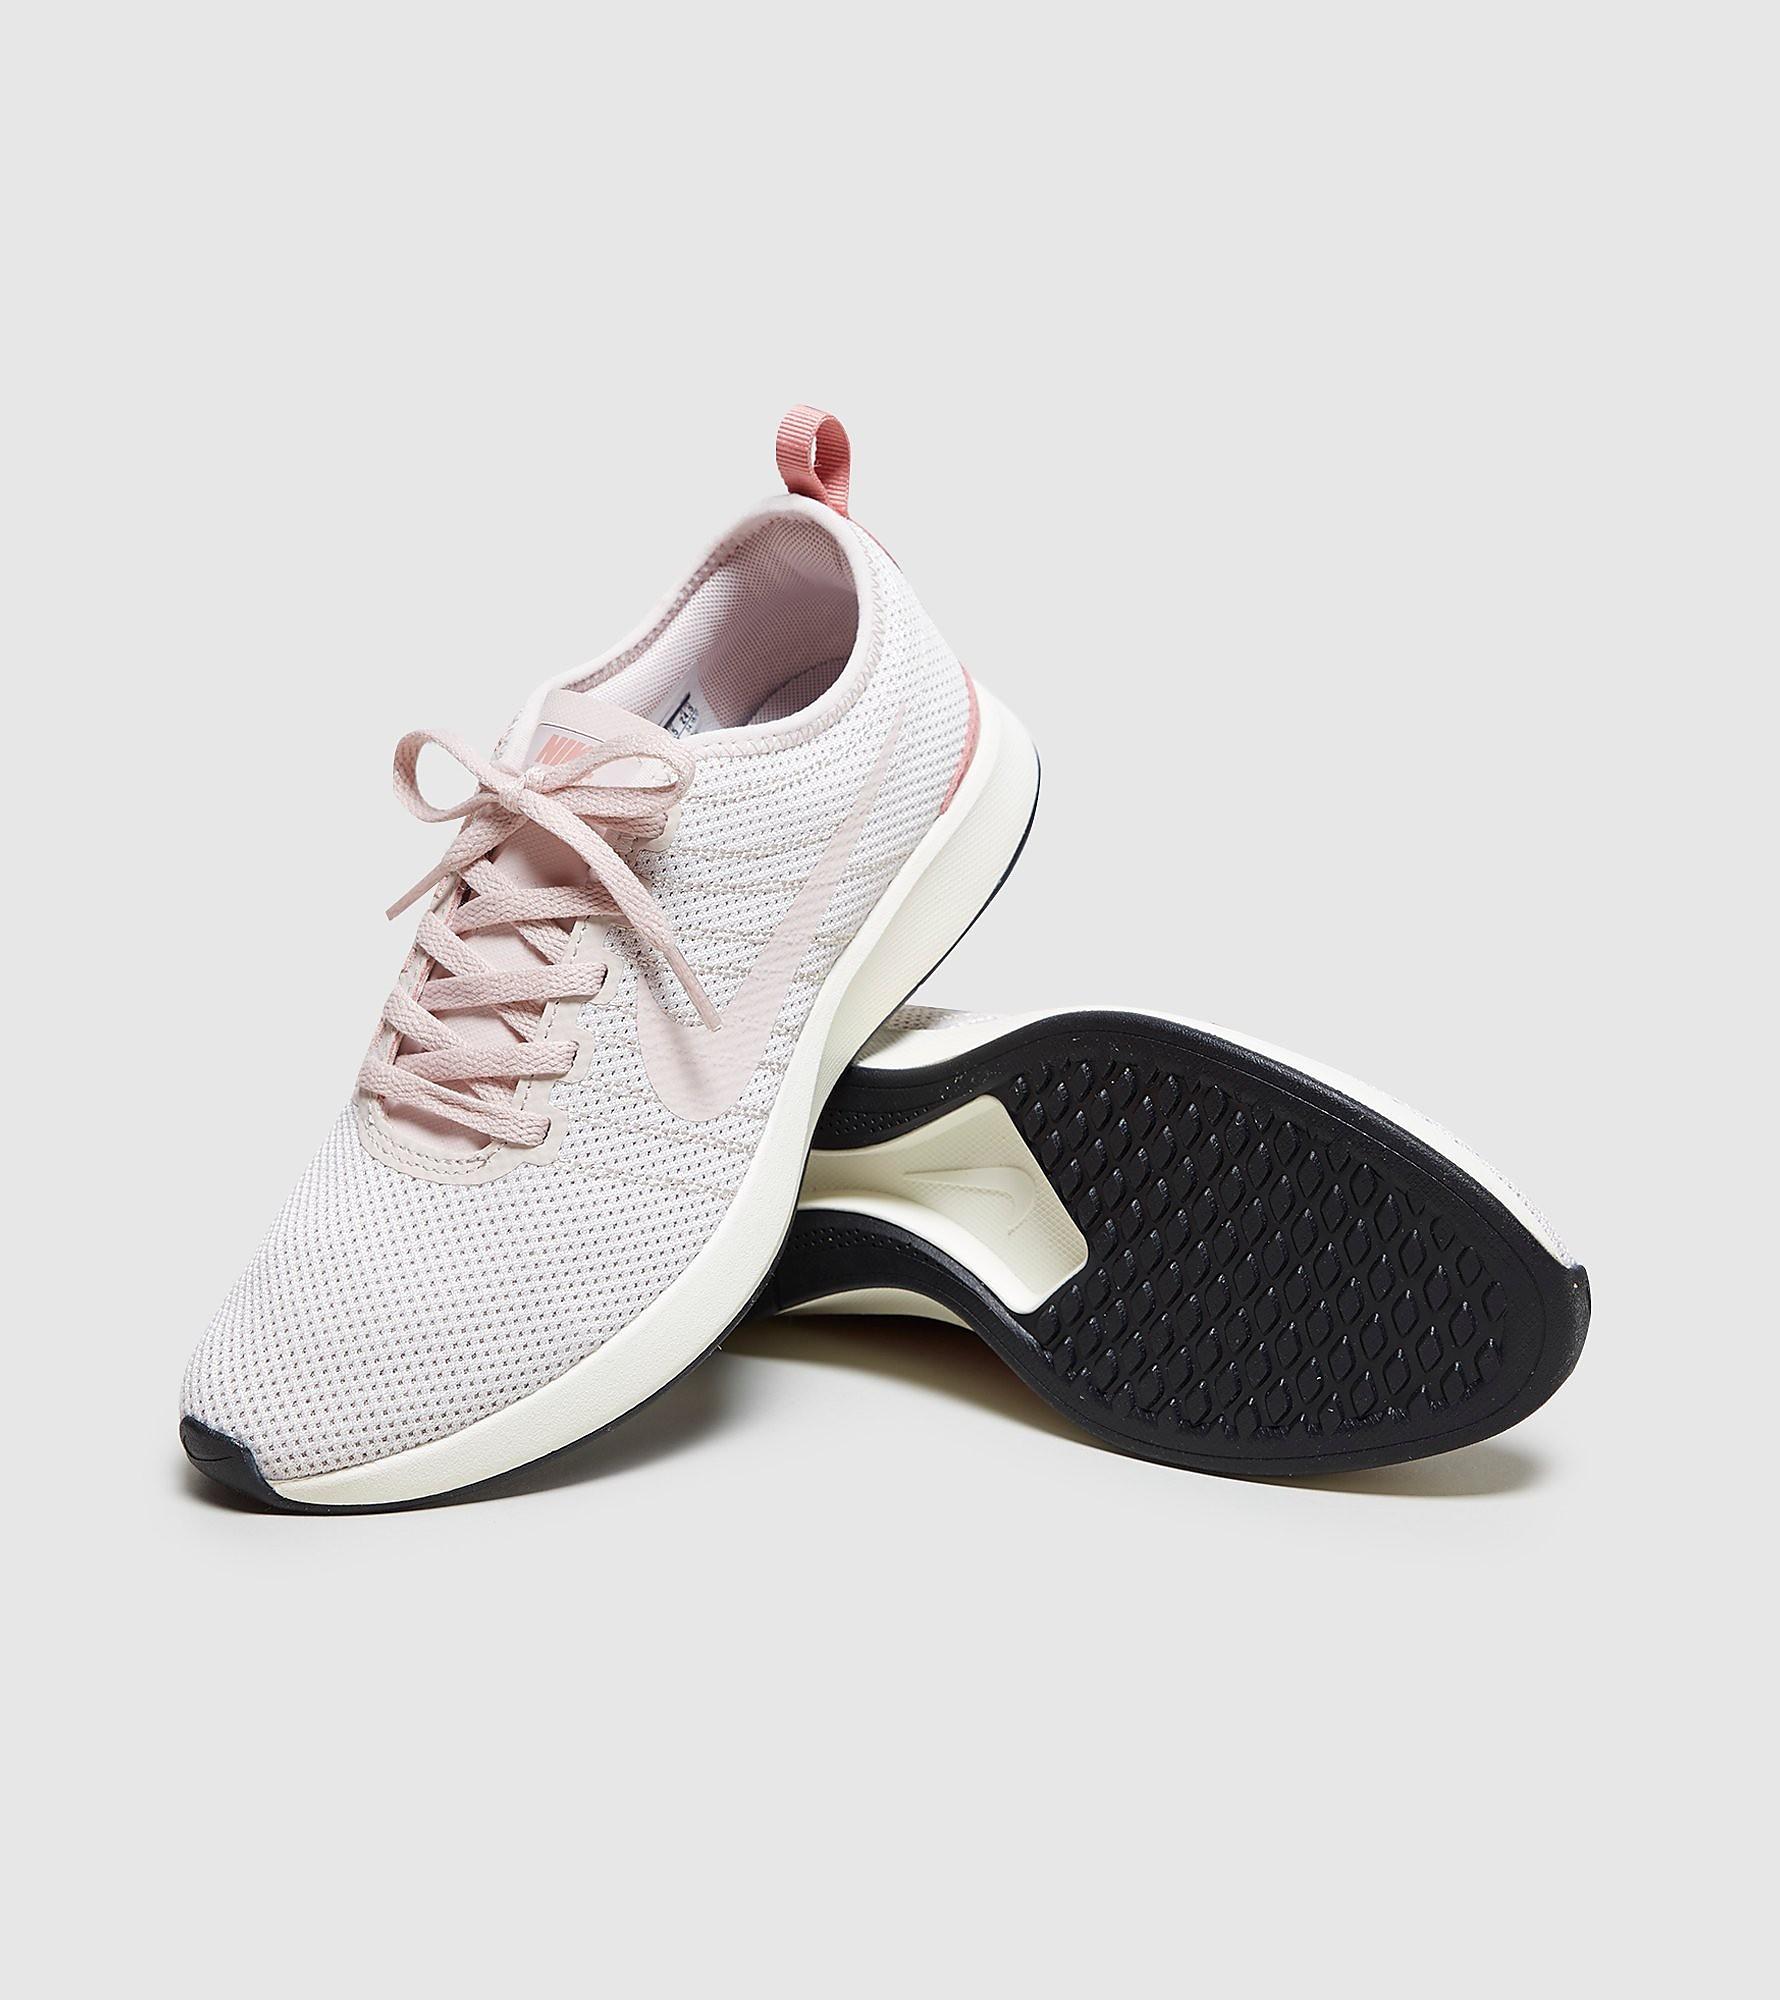 Nike DualTone Racer SE Women's